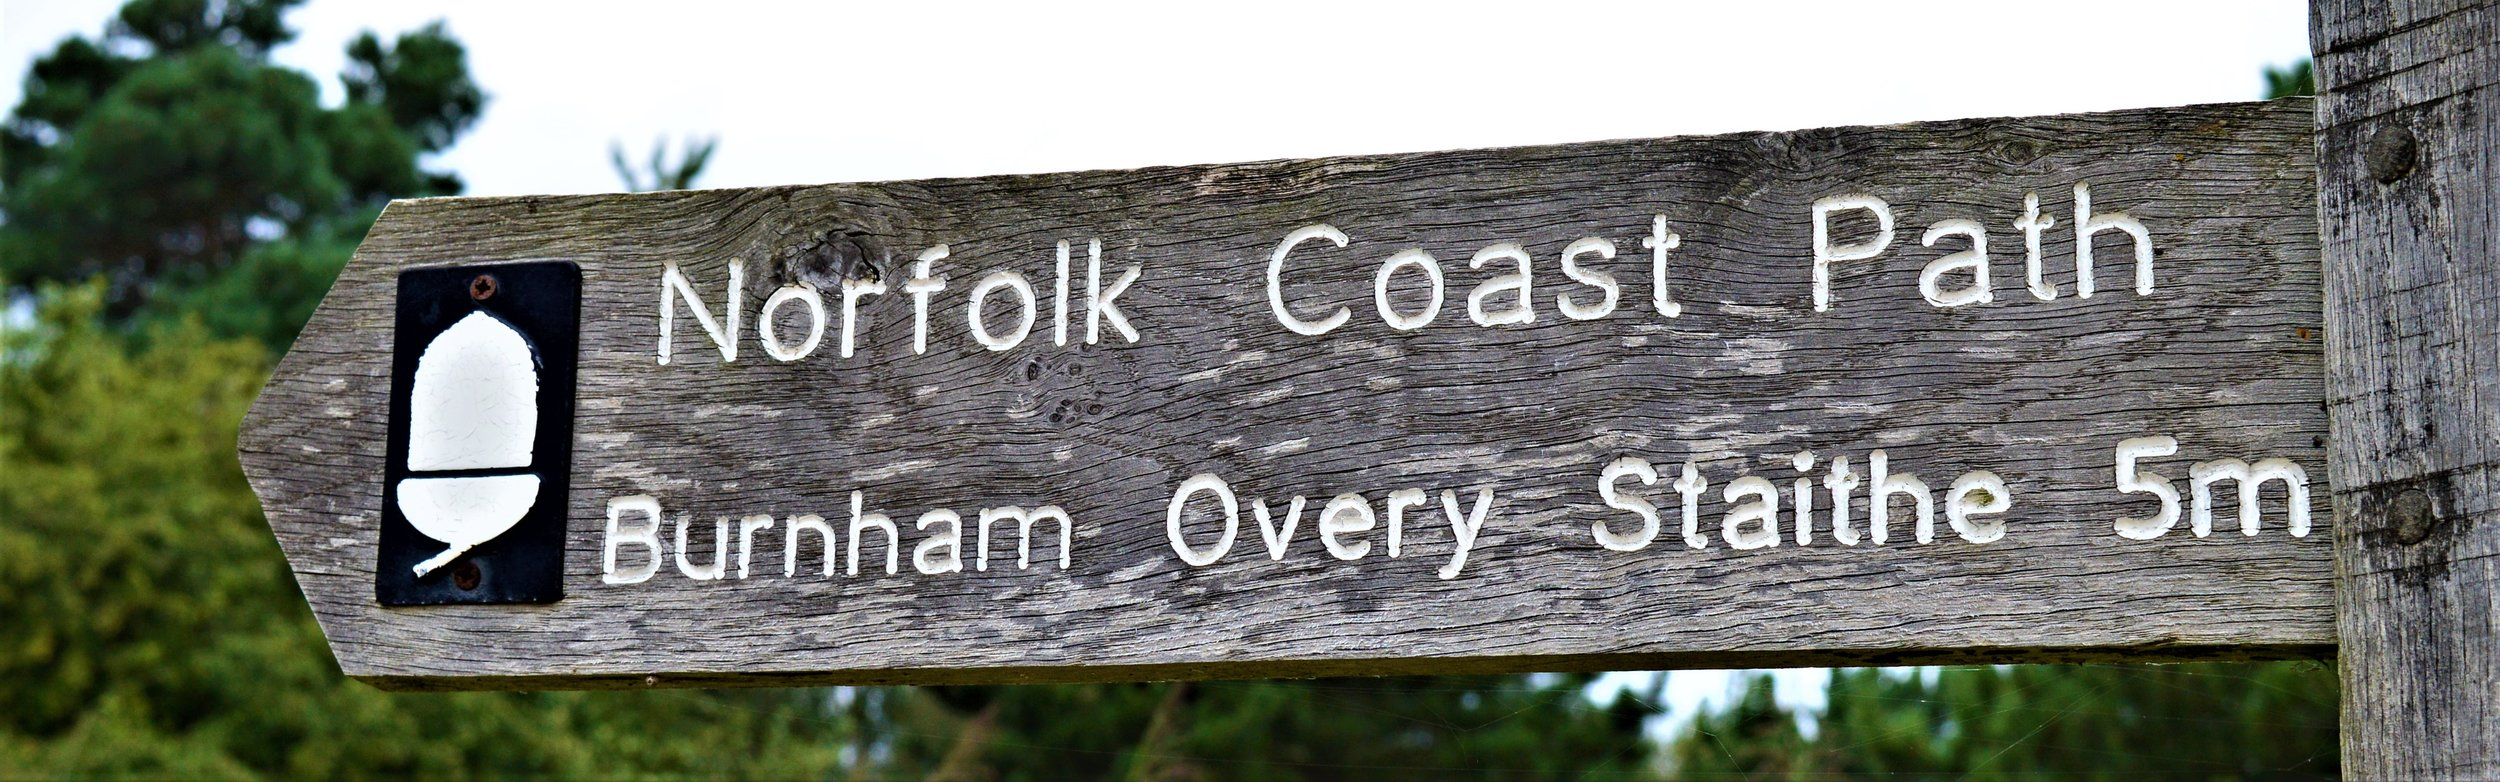 Burnham Overy Staithe - - The Rural Travel Guide